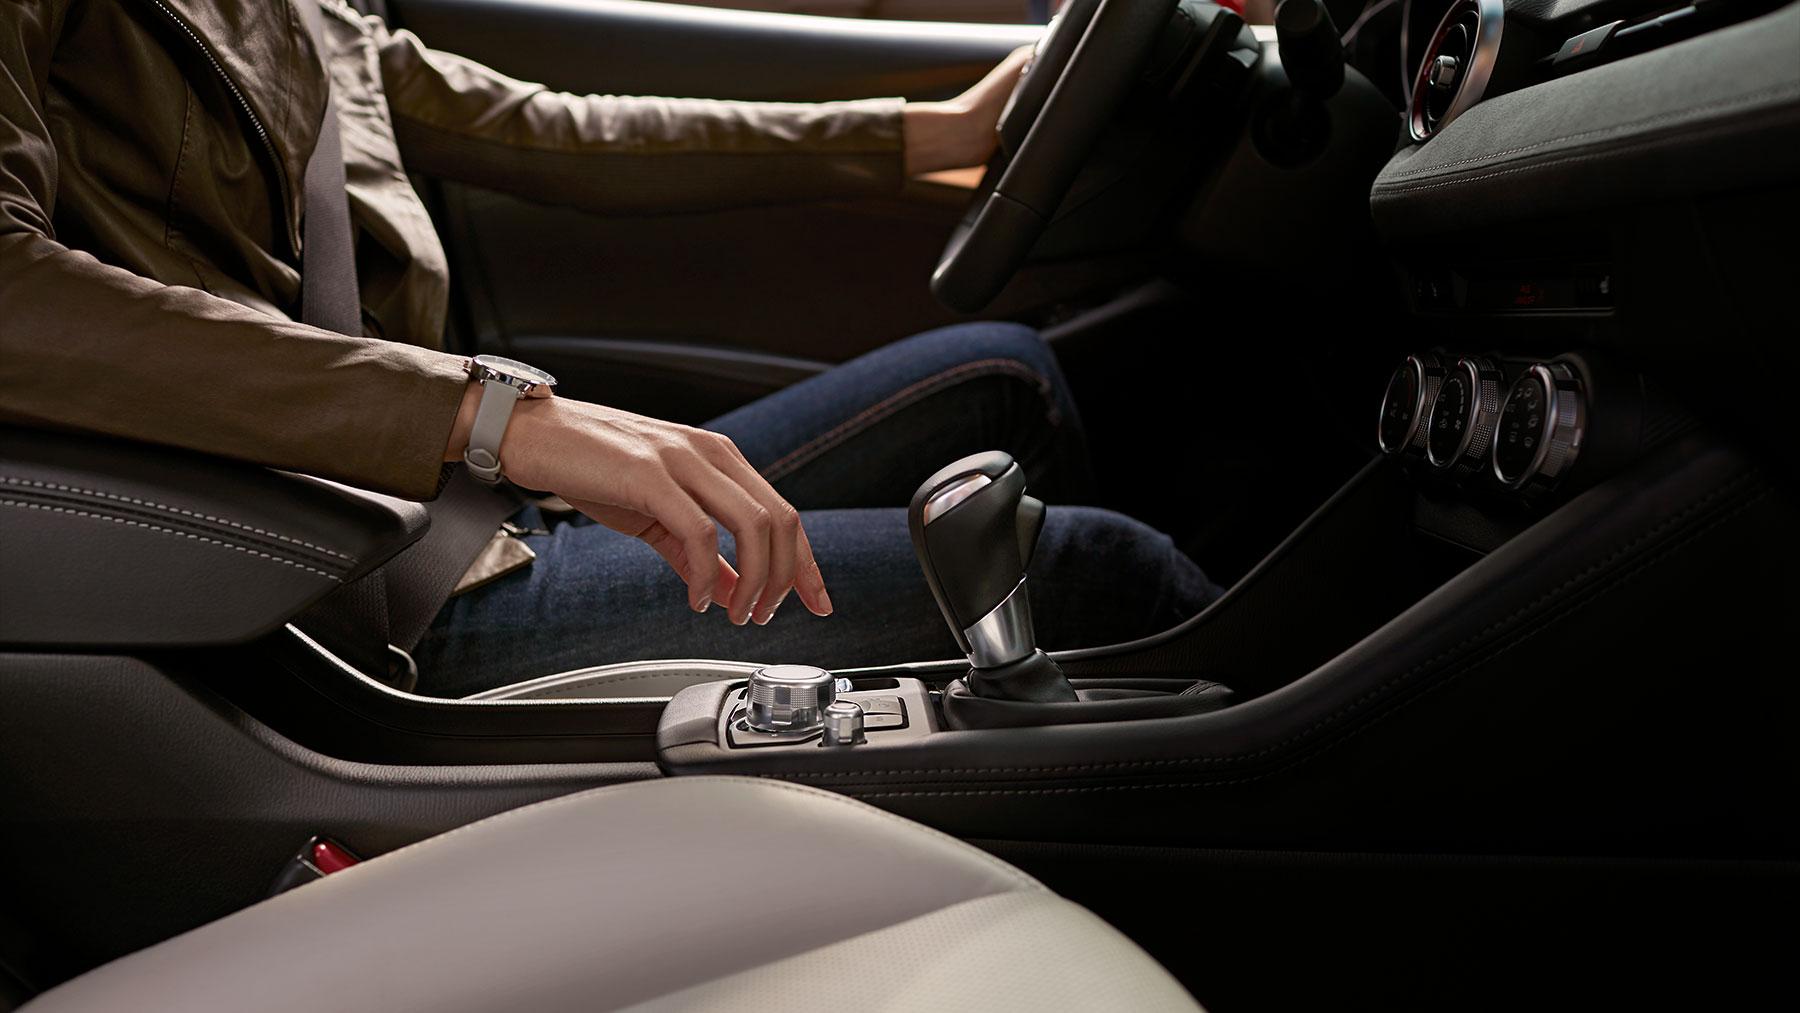 2020 Mazda CX-3 Technology